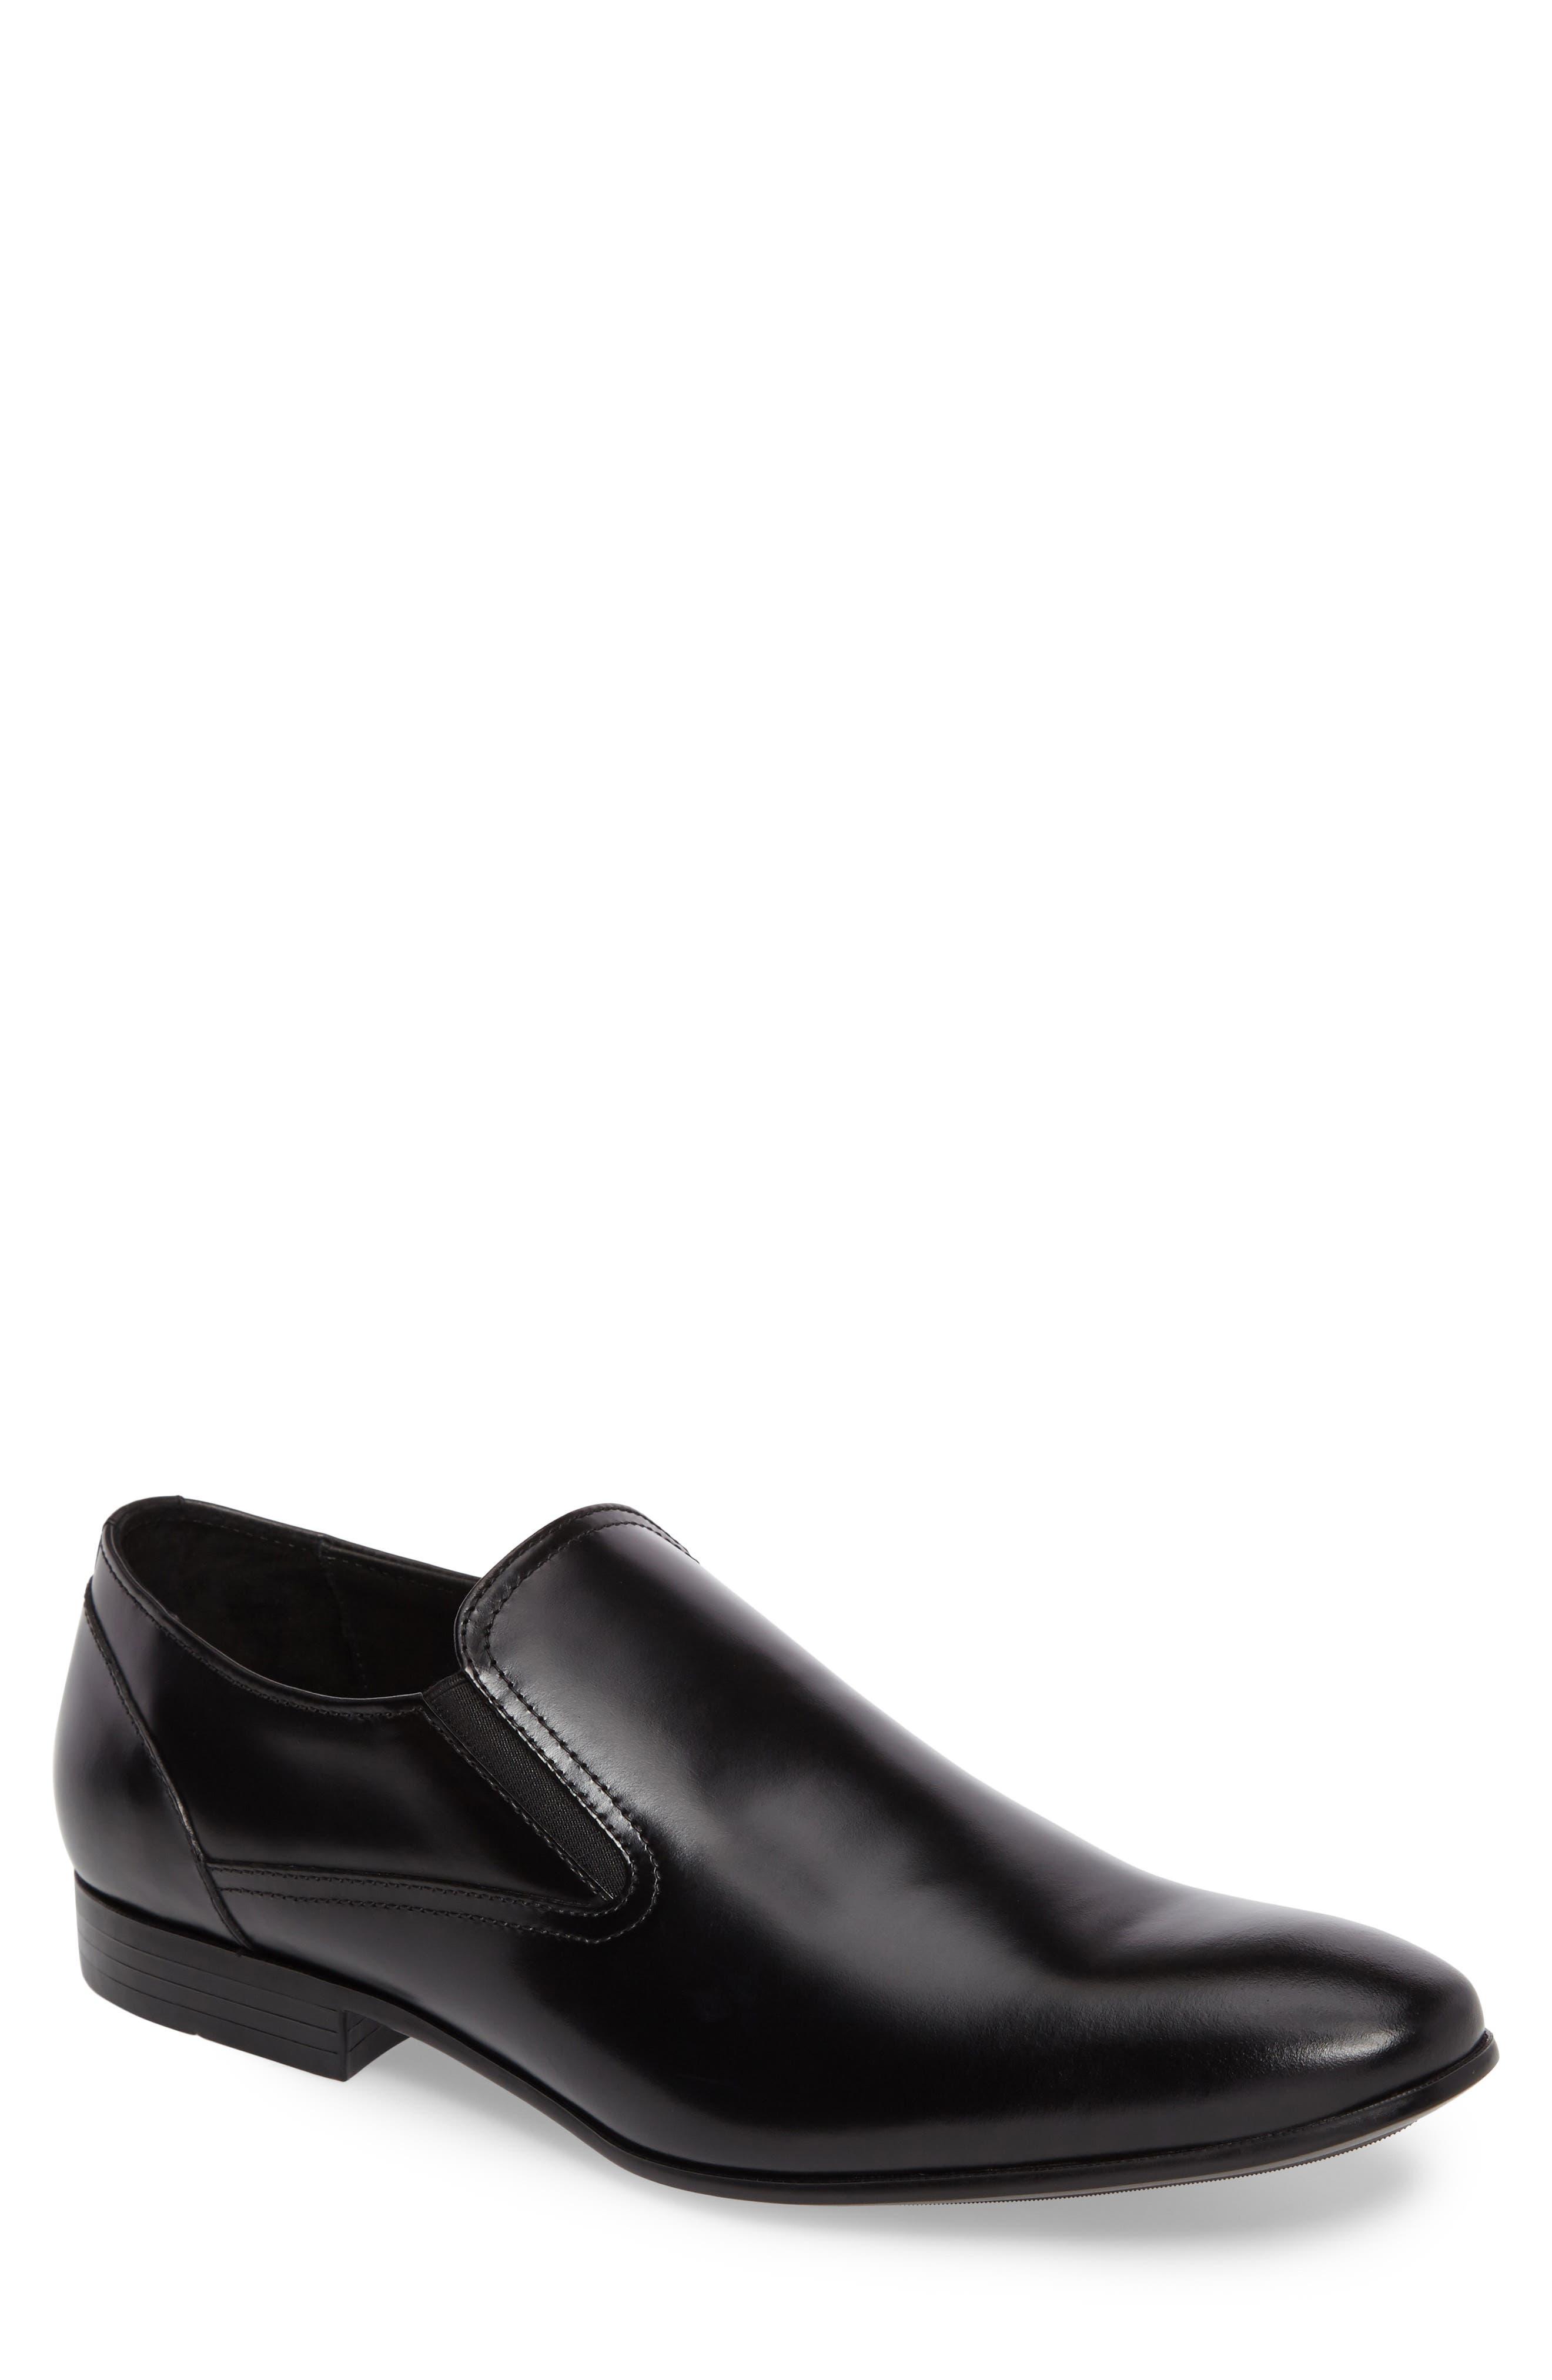 Venetian Loafer,                             Main thumbnail 1, color,                             Black Leather